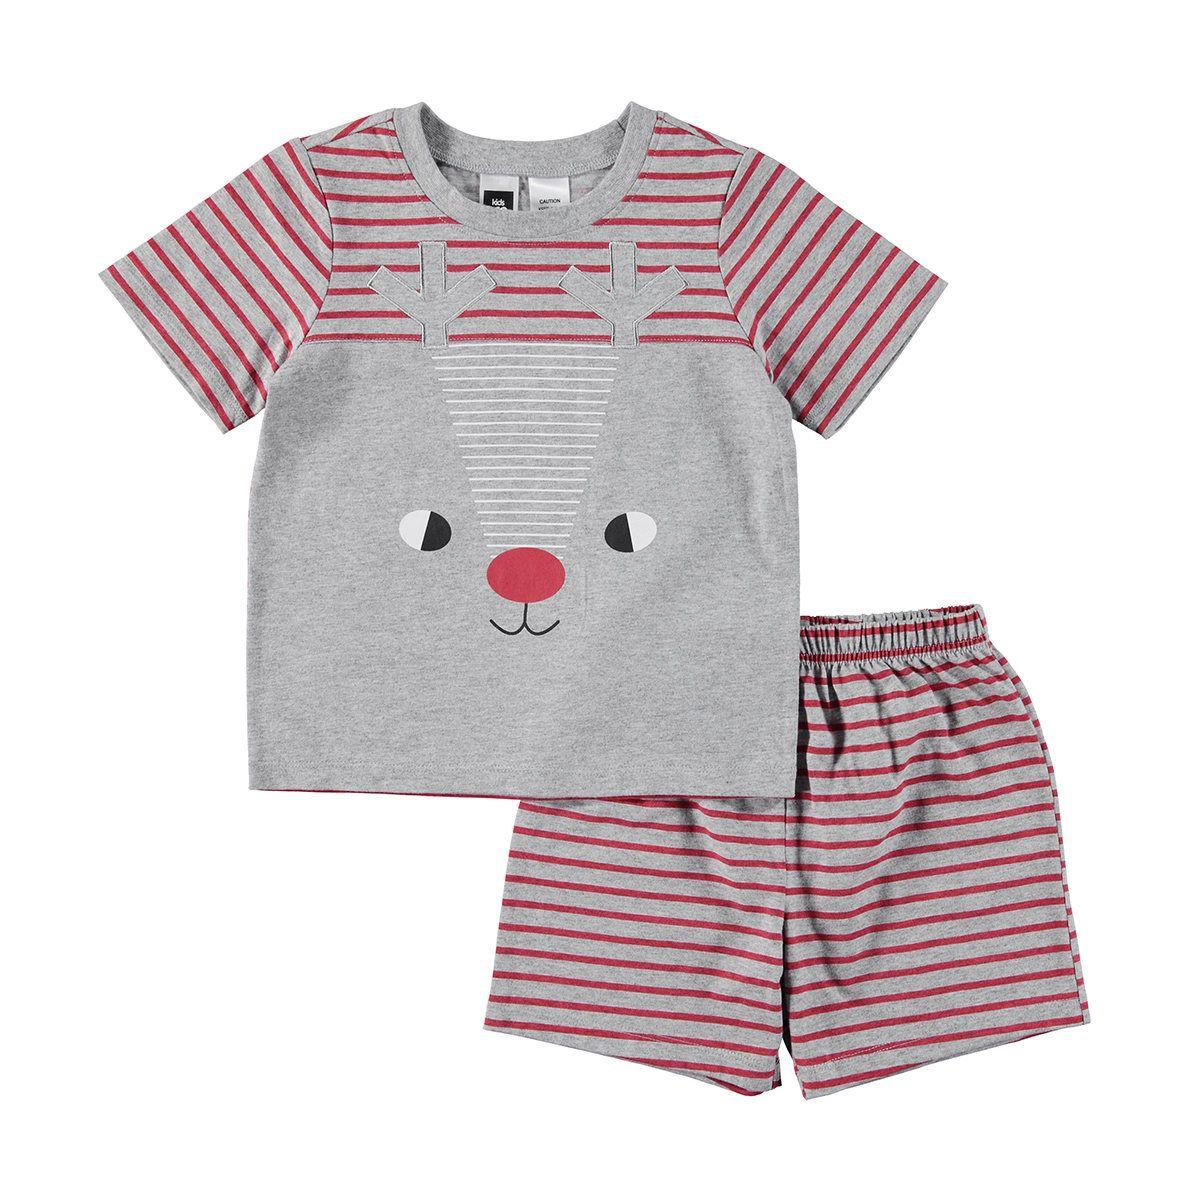 Novelty Pyjama Set | Kmart | Pajama set, Striped top, Fashion